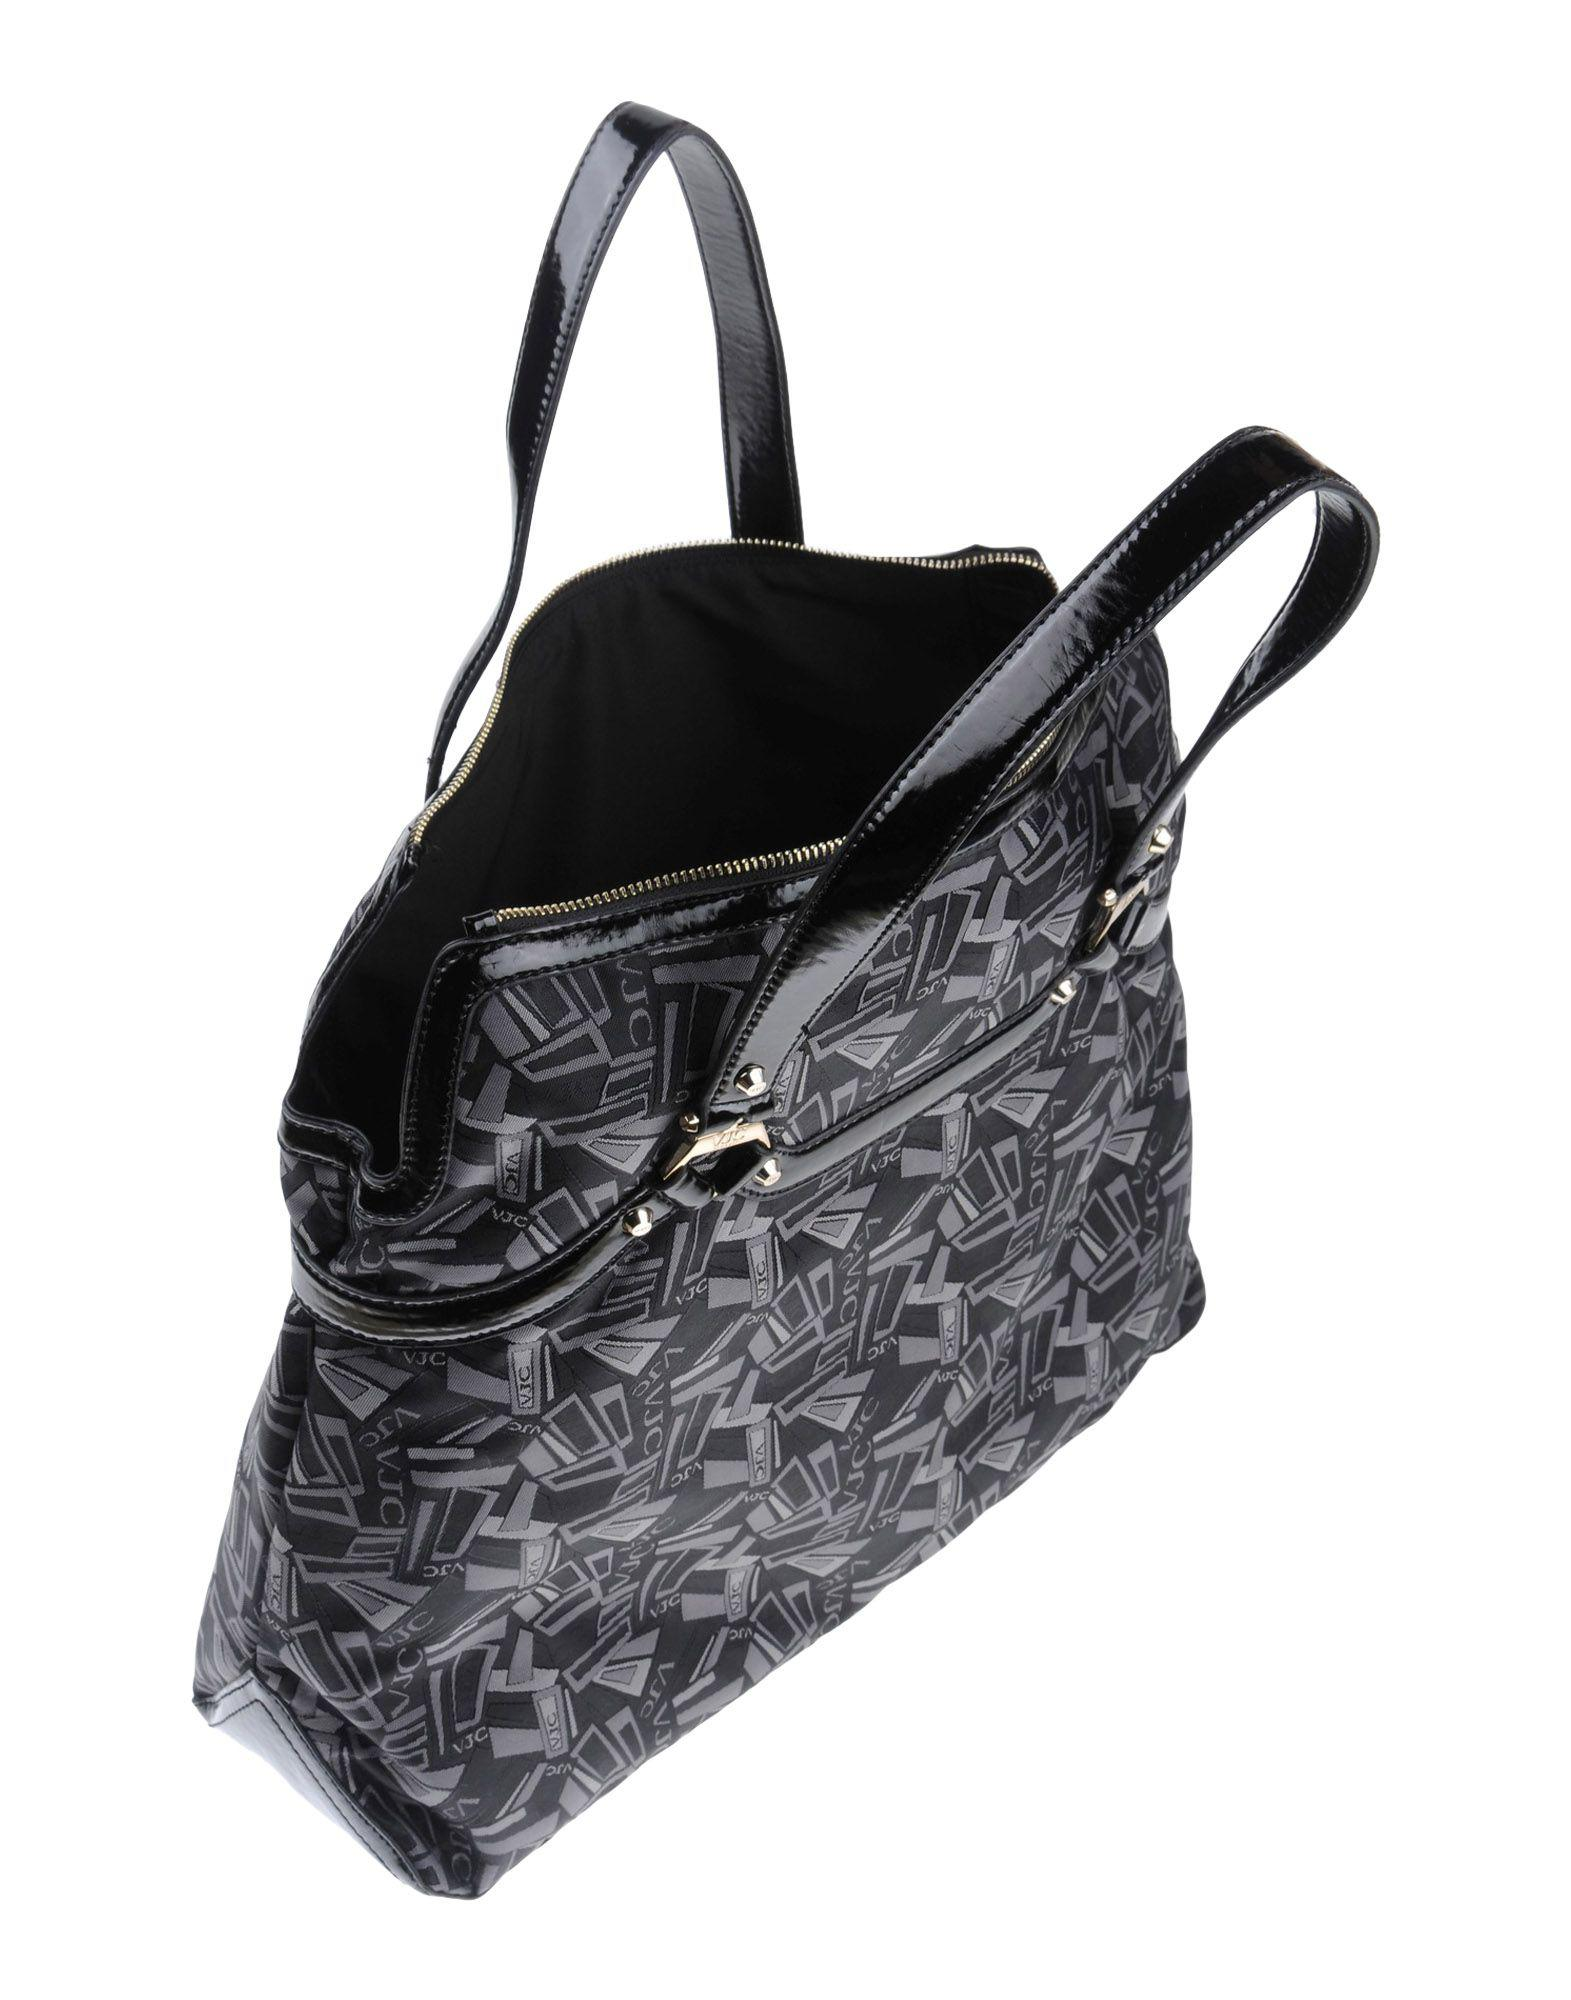 802f1688e7 Versace Jeans Handbag in Black - Lyst